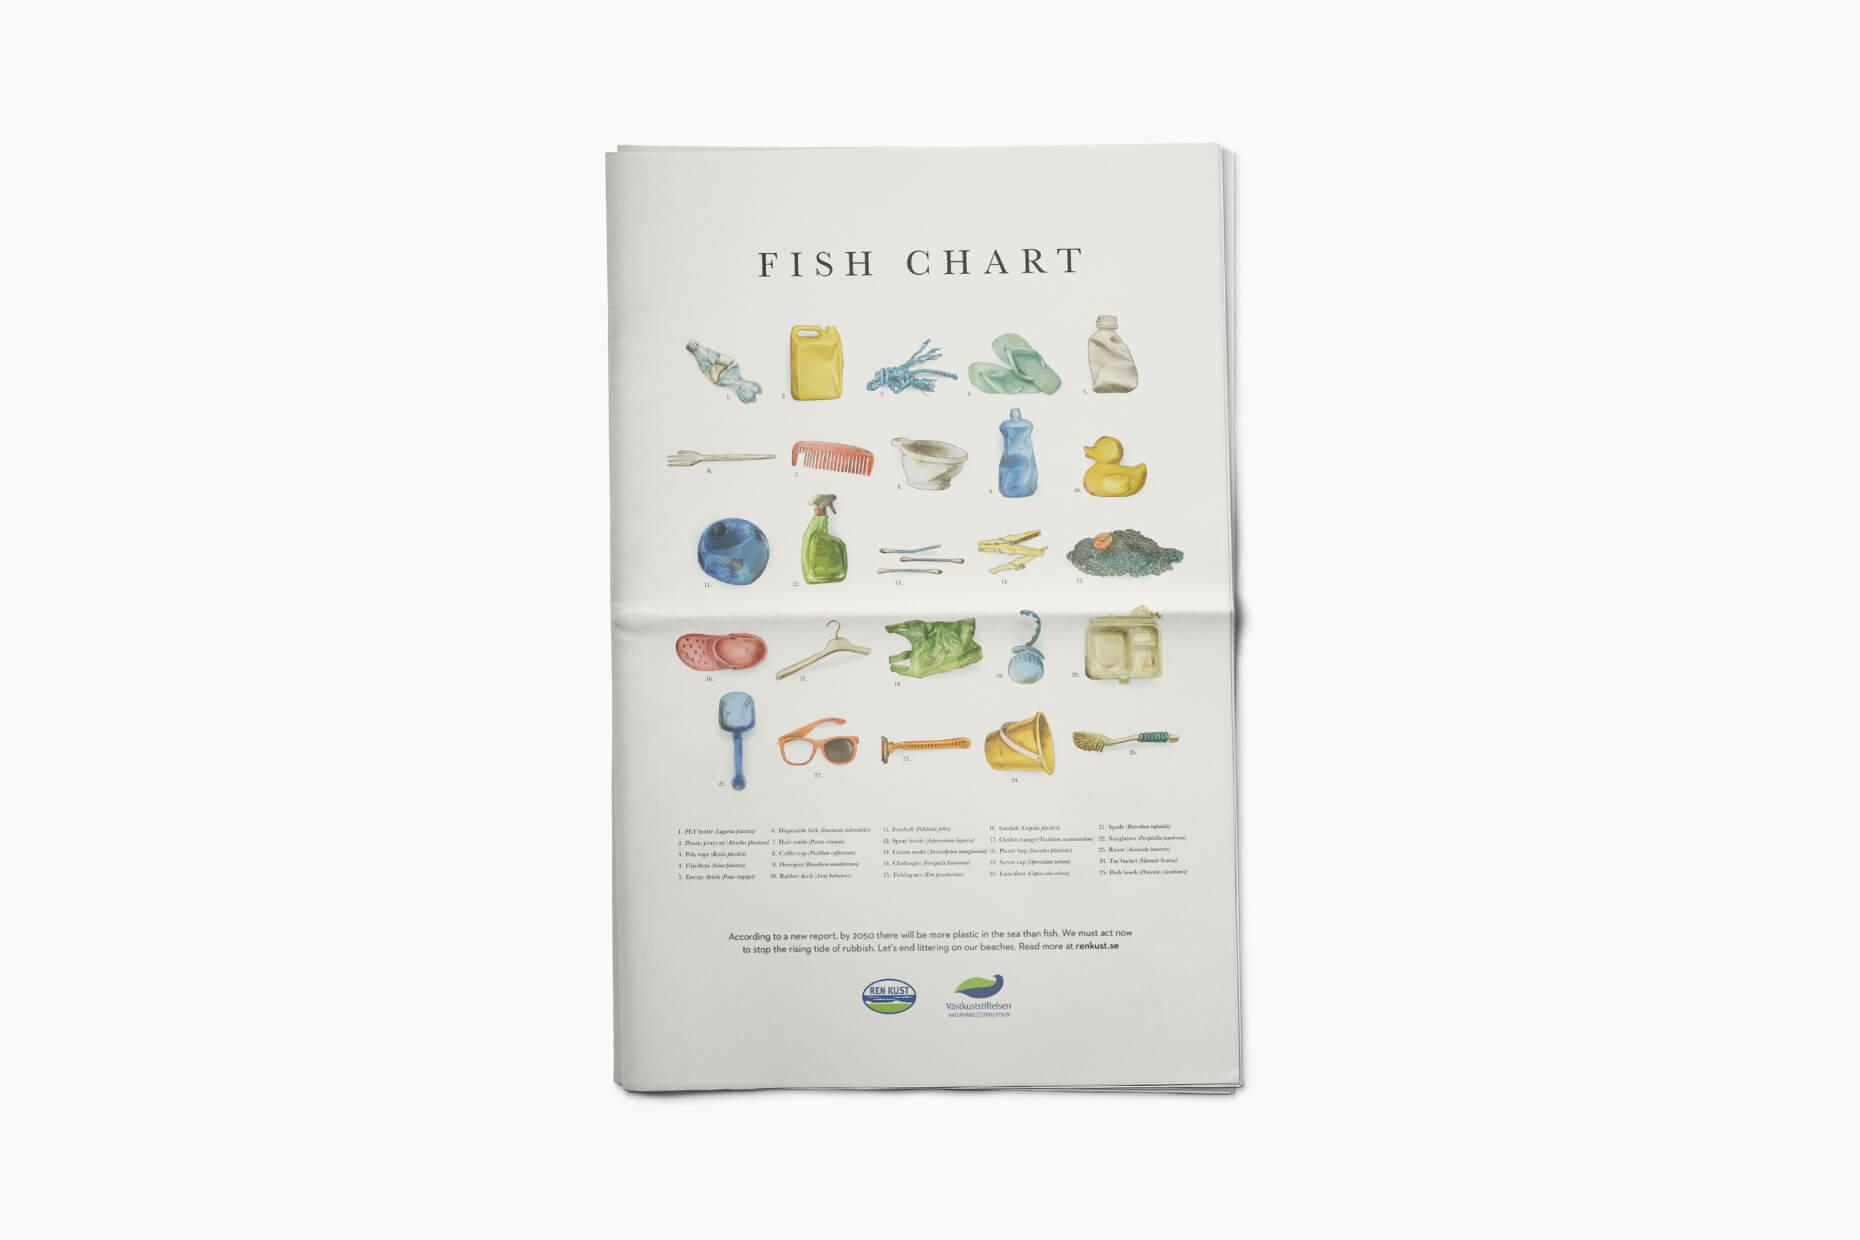 Fishchart_02